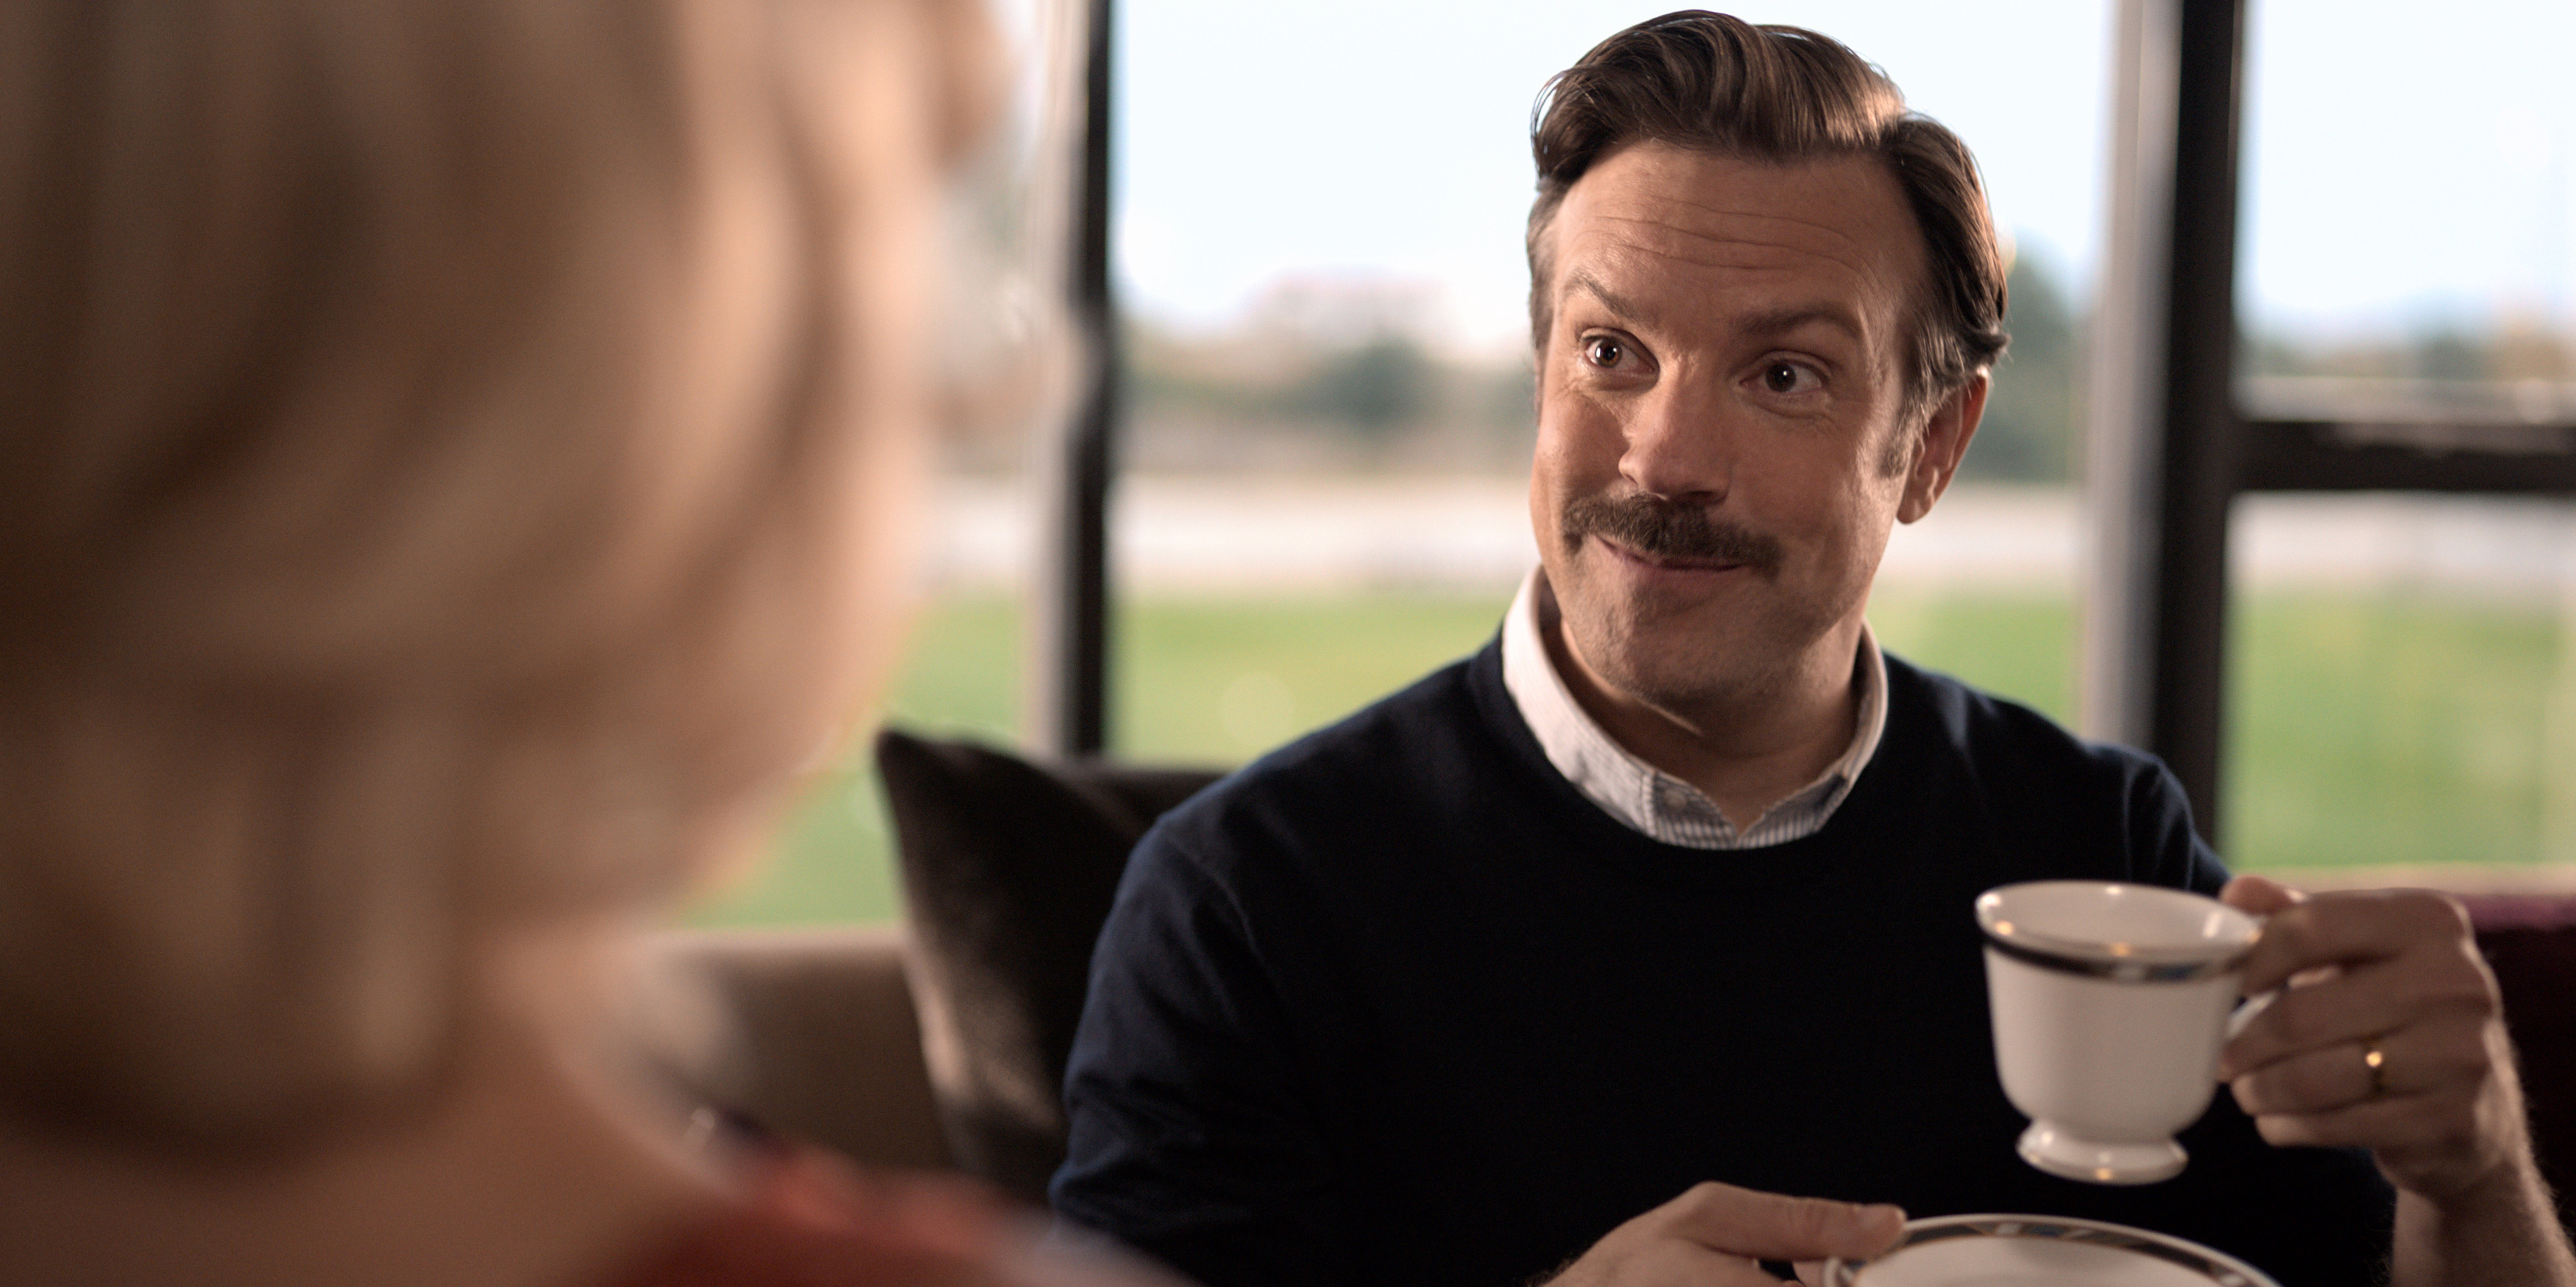 'Ted Lasso' season 2 trailer introduces us to Led Tasso